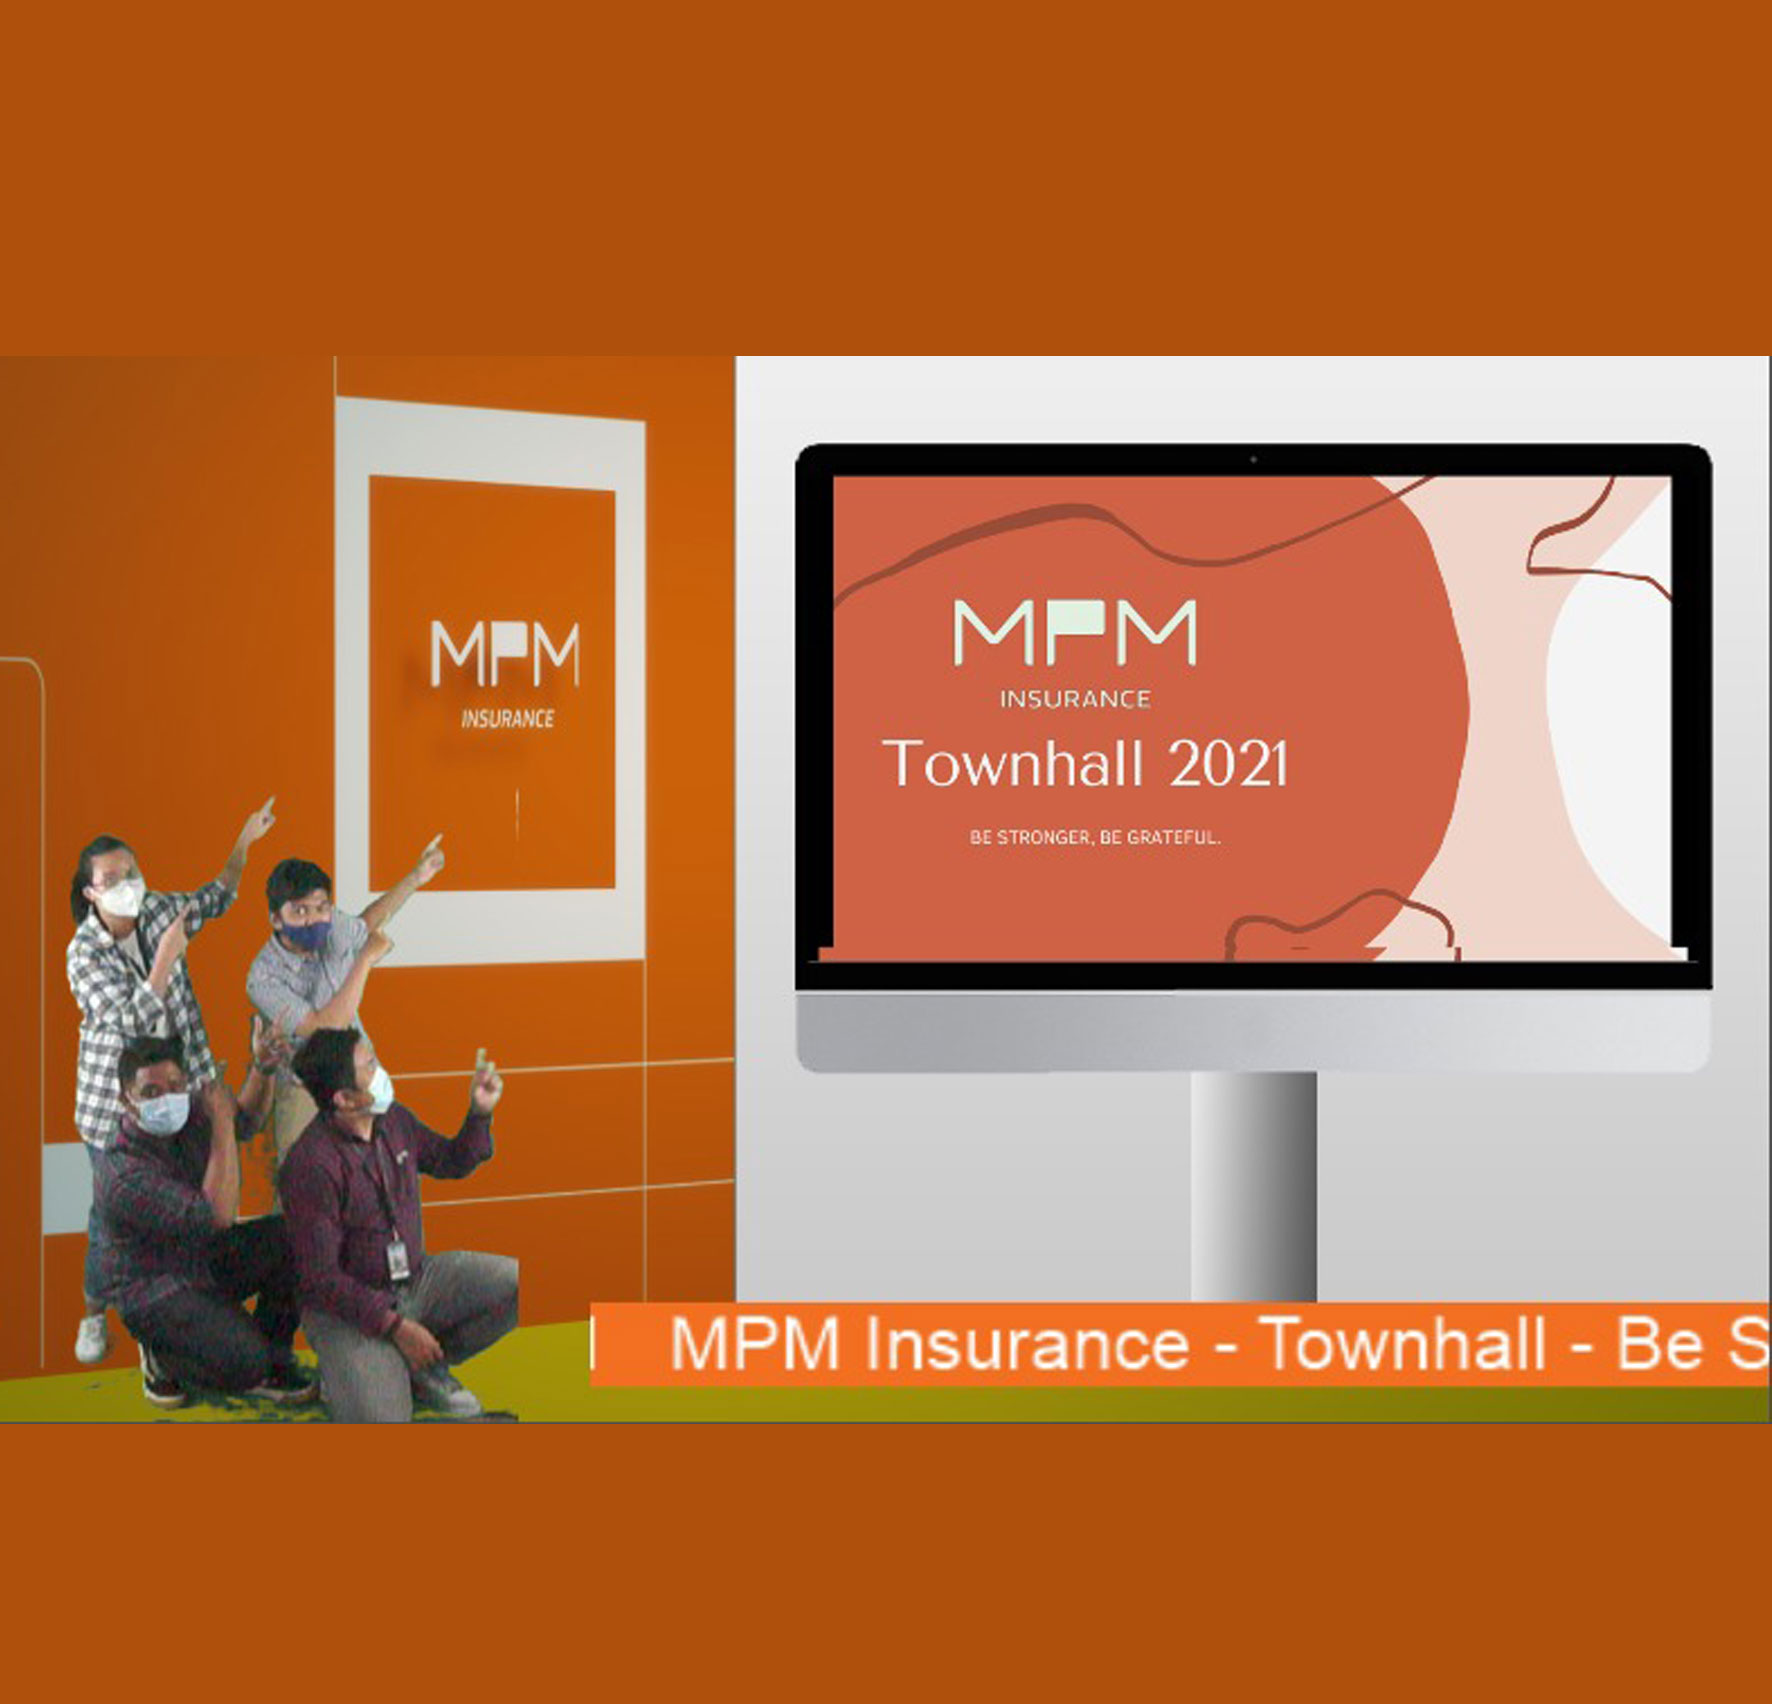 MPMInsurance Gelar Virtual Townhall Untuk Perkuat Sinergi dan Kerja Sama